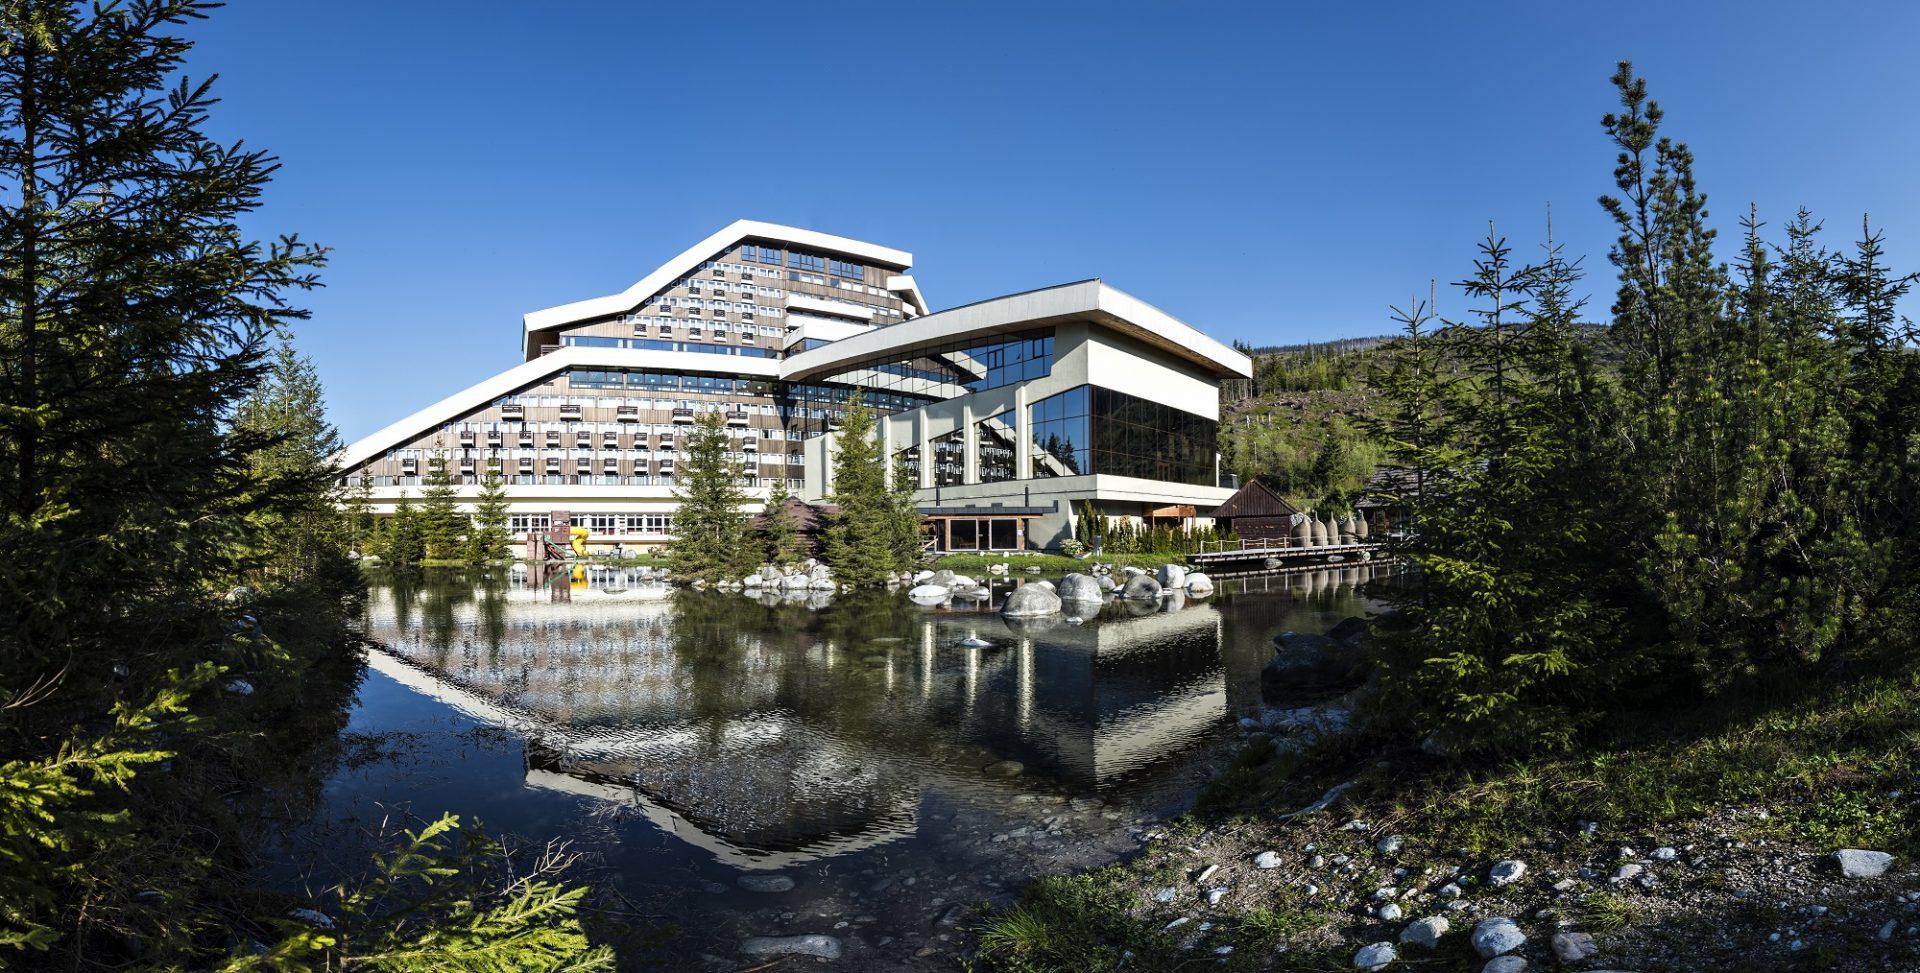 b0962120e SK-Kongres-grand-hotel-permon-podbanske-teambuildingove-wellness -horske-hotely-hlavna